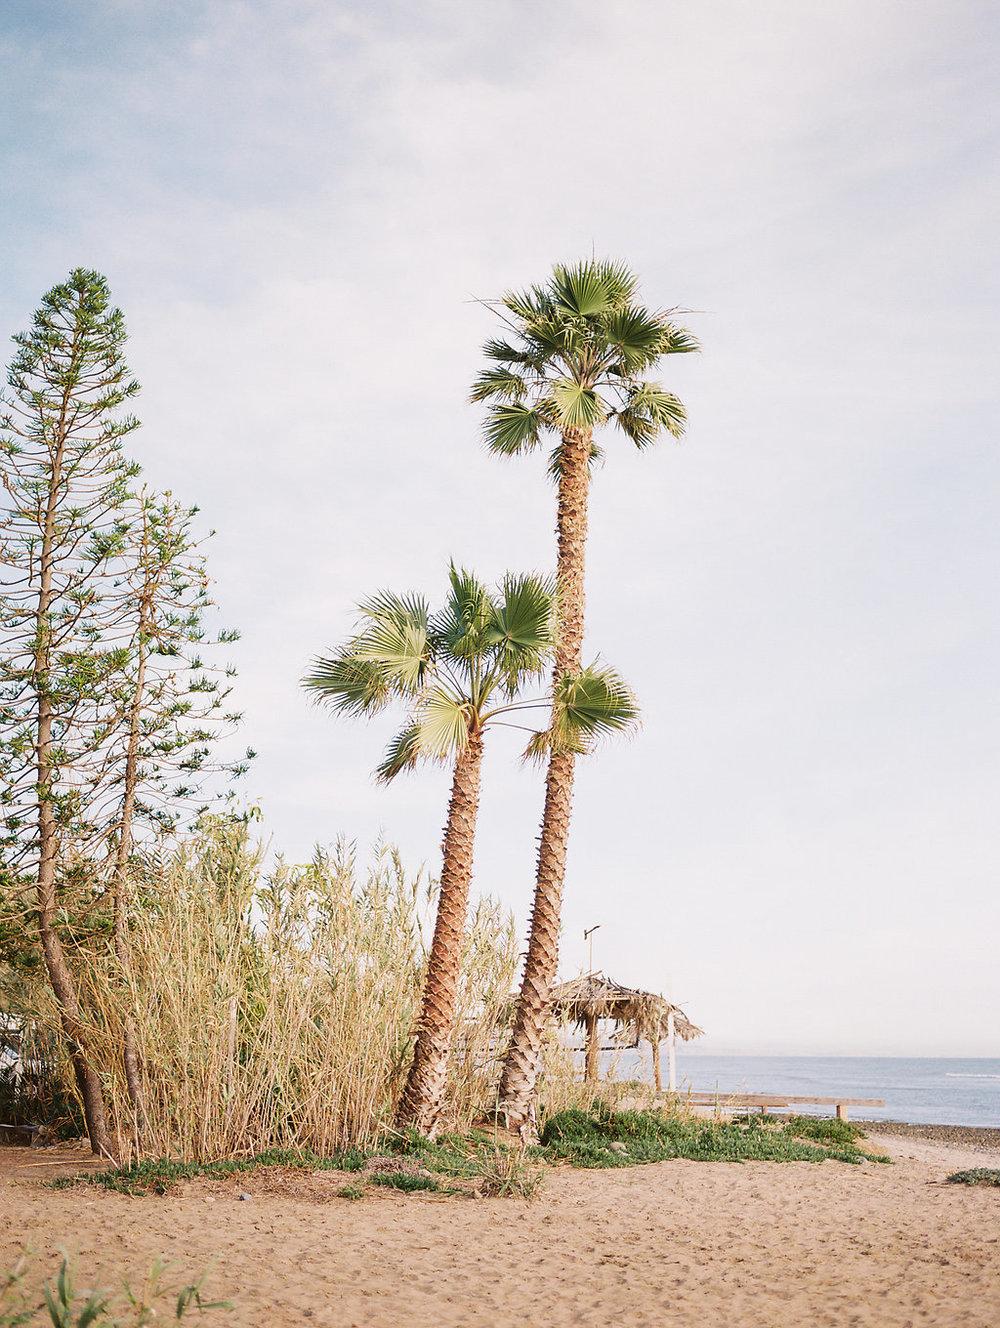 Southern California Beach Wedding by Heather Anderson Photography (www.heatherandersonphoto.com).